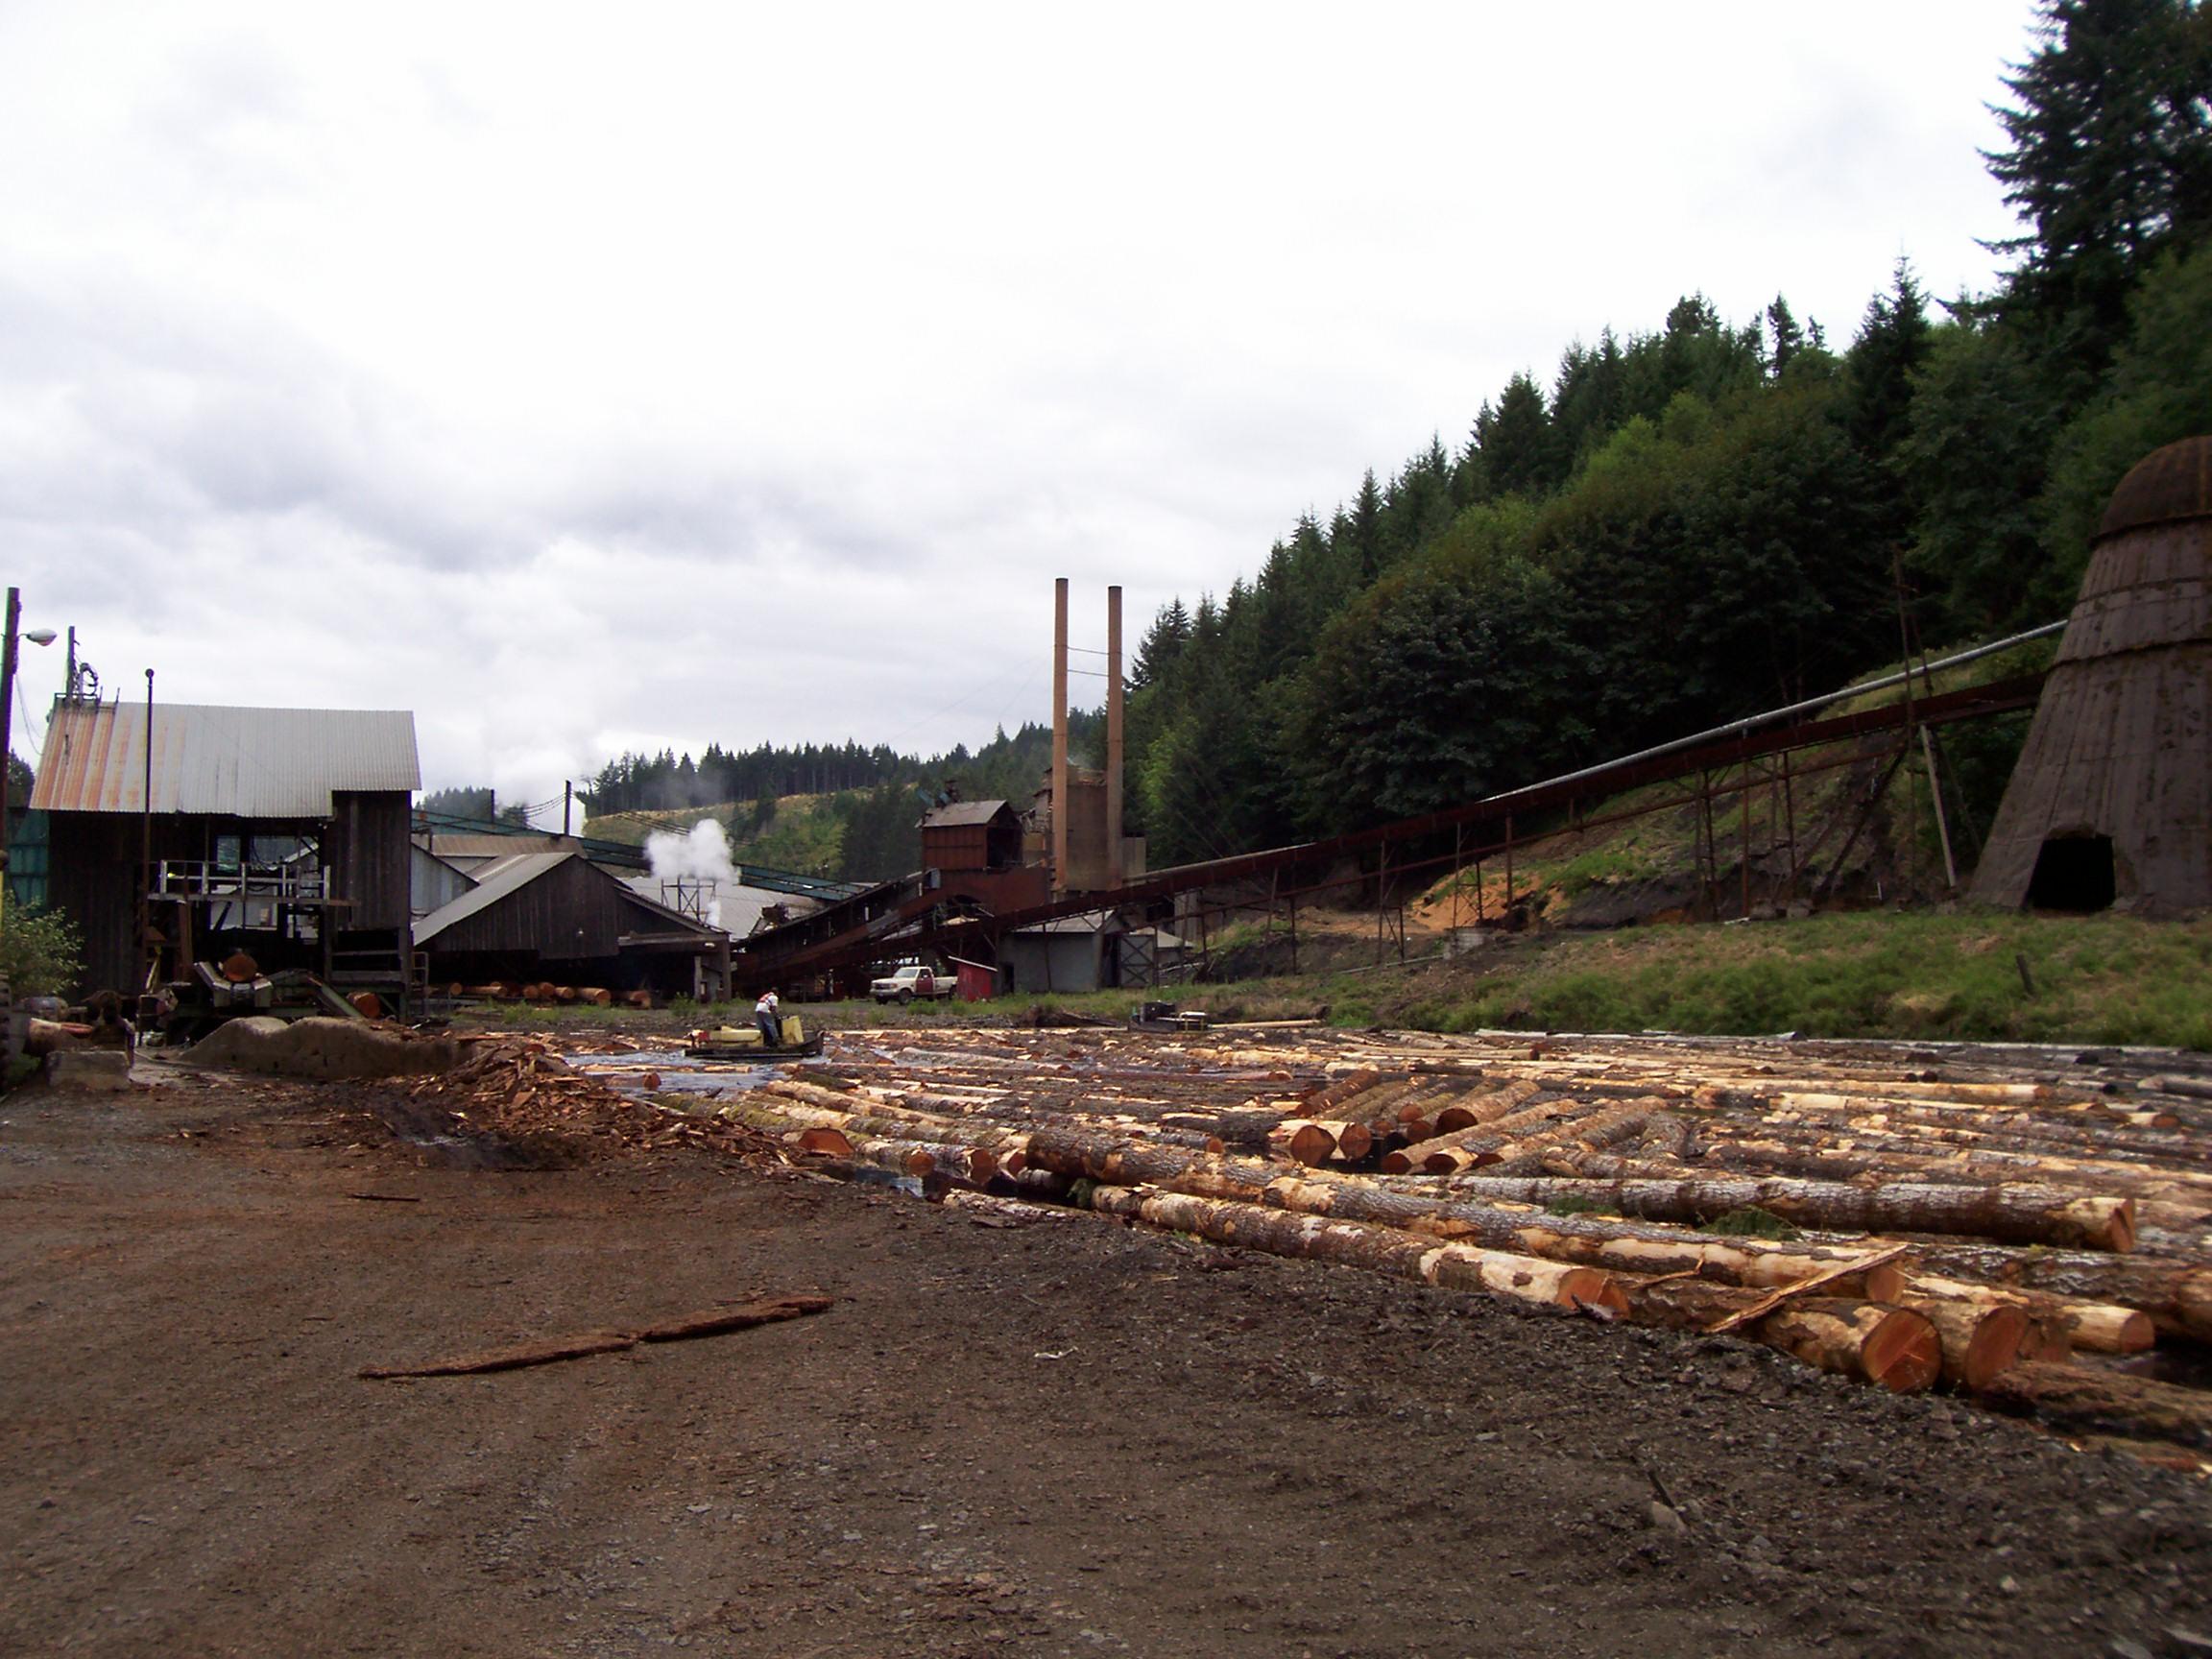 U S Plywood Corporation Locations ~ File hull oakes lumber company g wikimedia commons